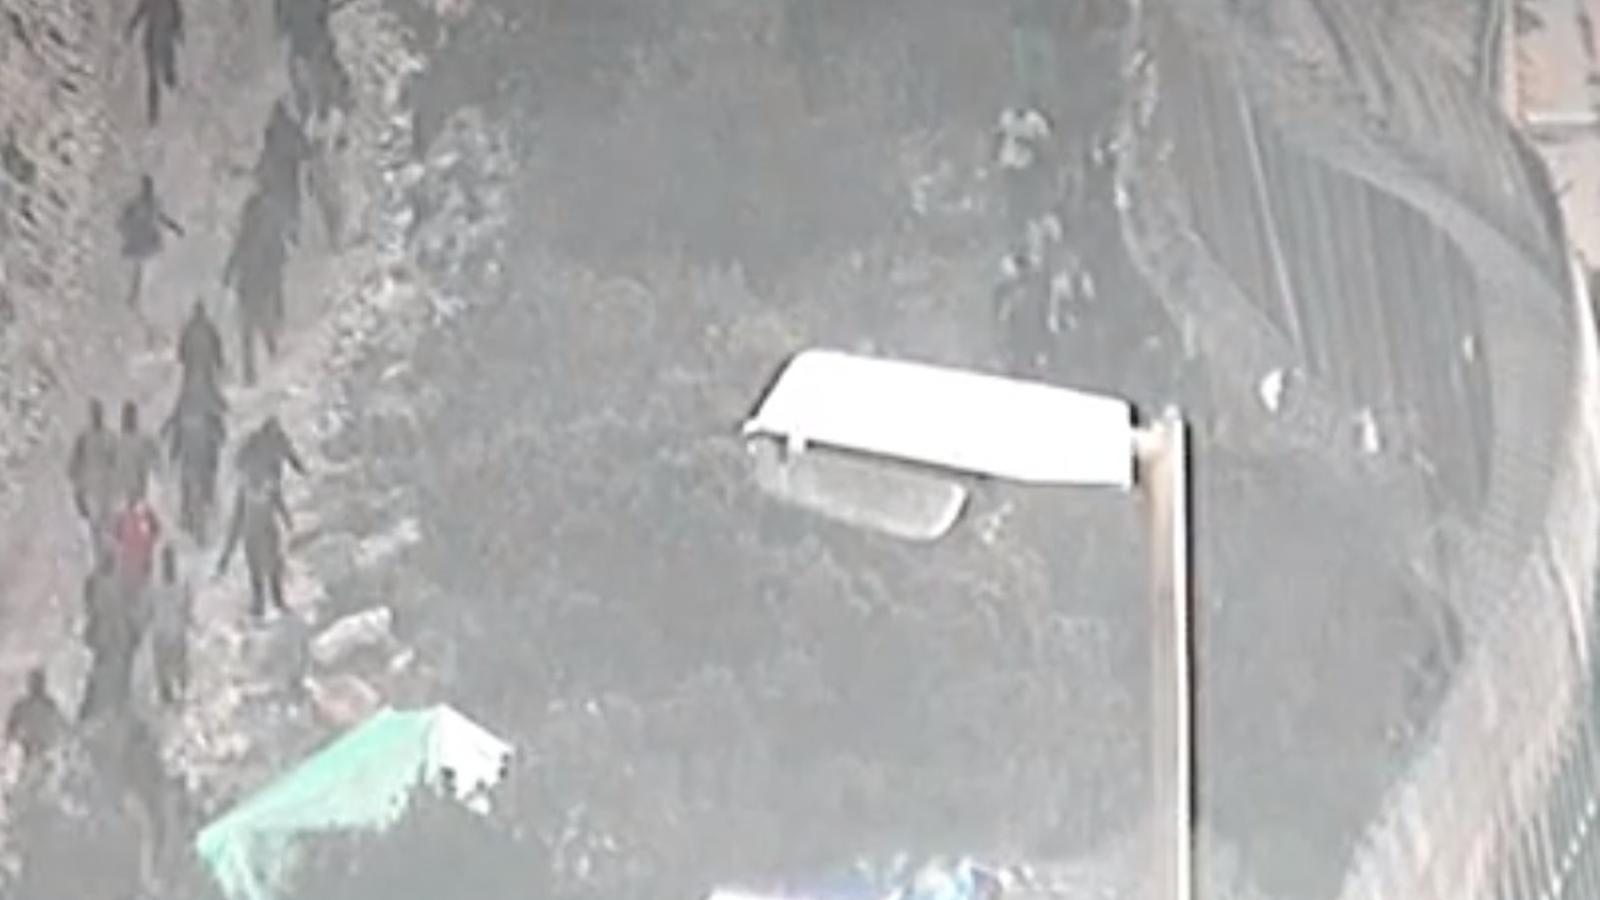 Mig miler de subsaharians salten la tanca de Melilla